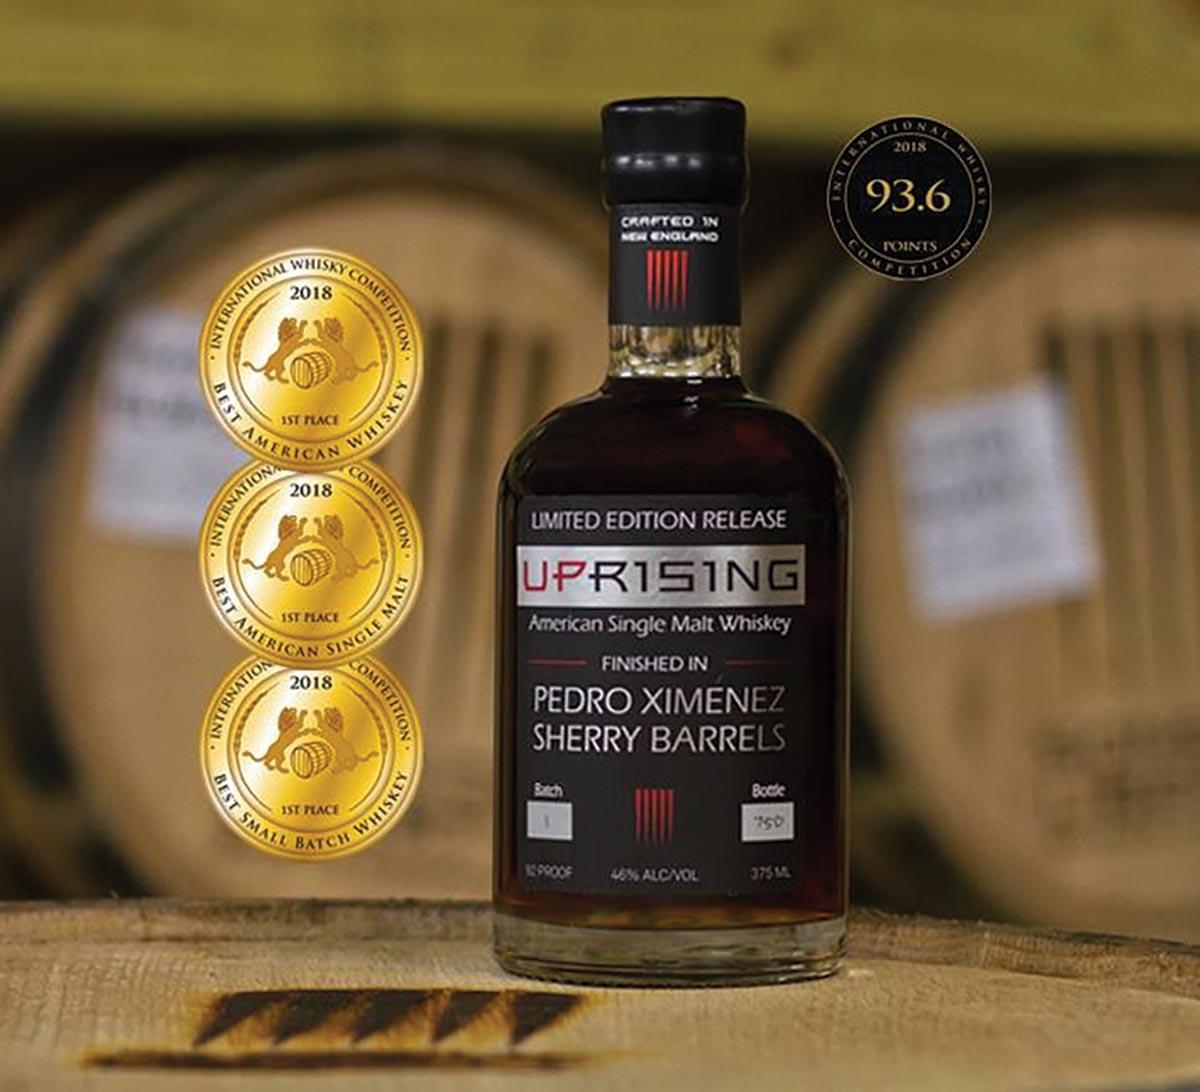 Sons of Liberty Beer & Spirits Co. Earns 100th Award